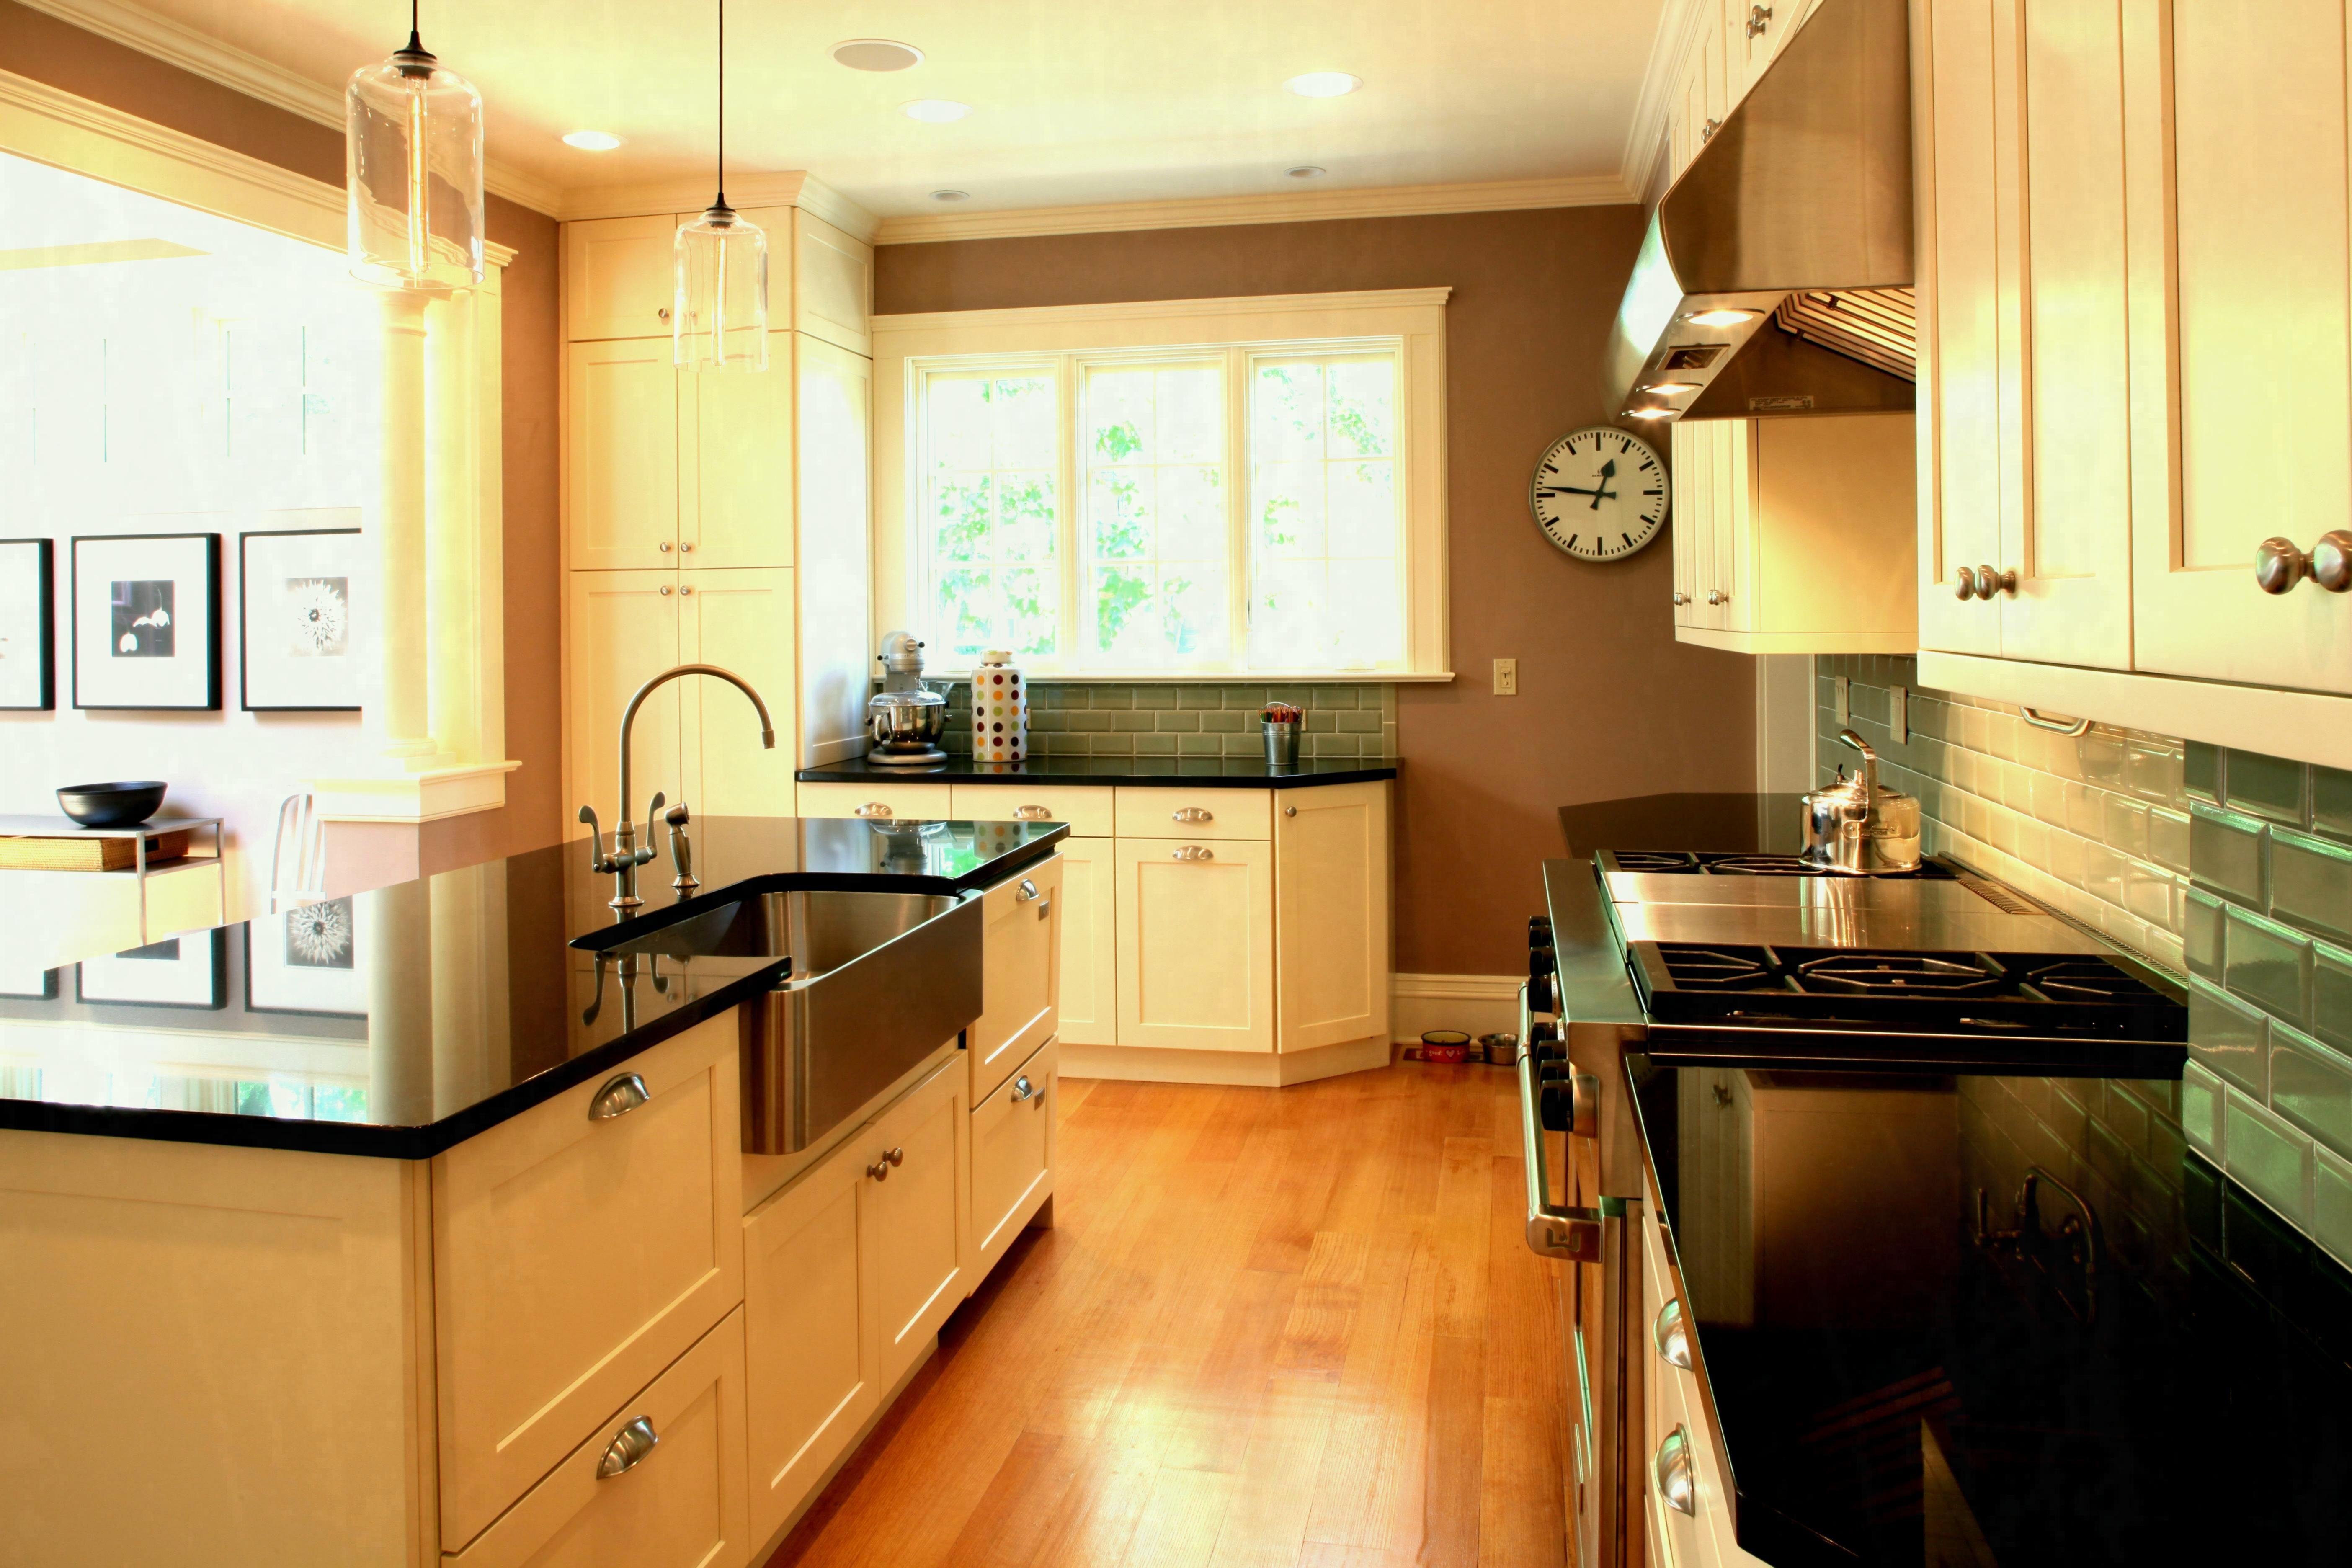 stunning kitchen island with sink and dishwasher ideas kitchen design small small kitchen on kitchen island ideas cheap id=35934